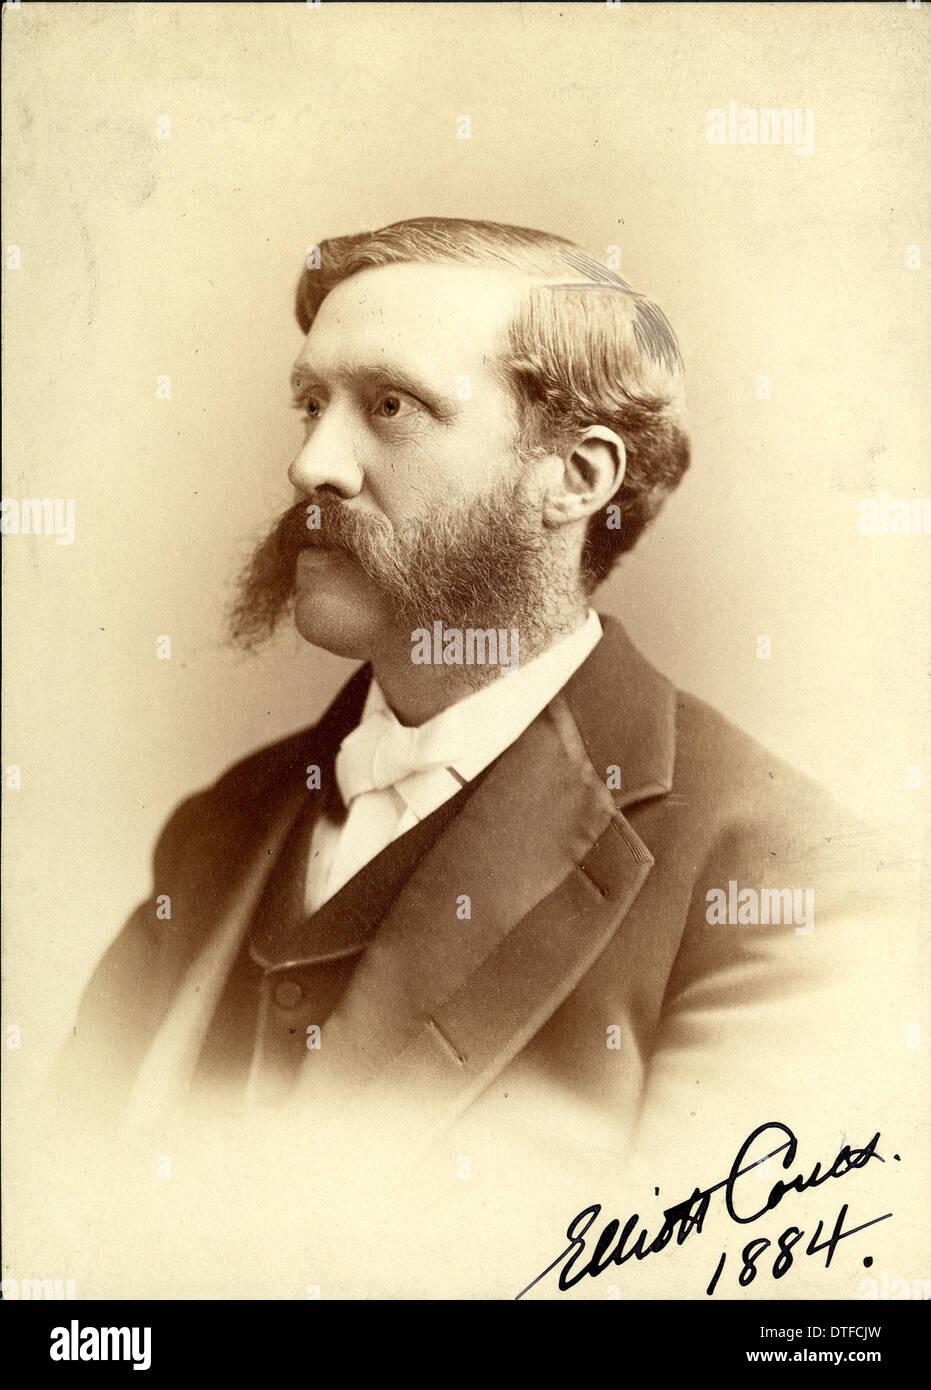 Elliott Cowes (1842-1899) - Stock Image